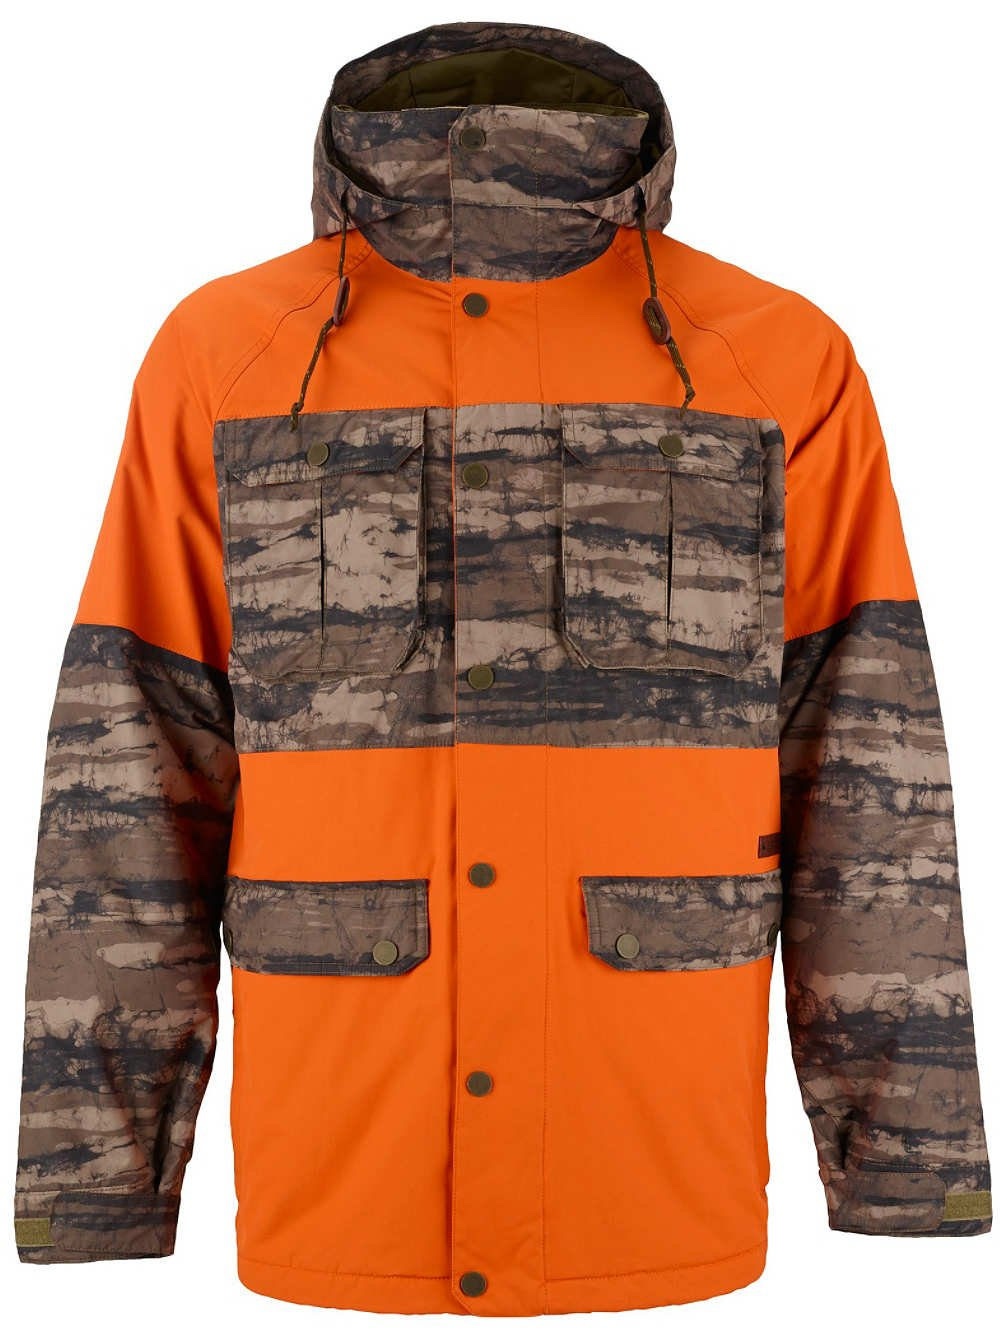 BURTON FRONTIER Jacke 2015 jersey tan/camo günstig bestellen